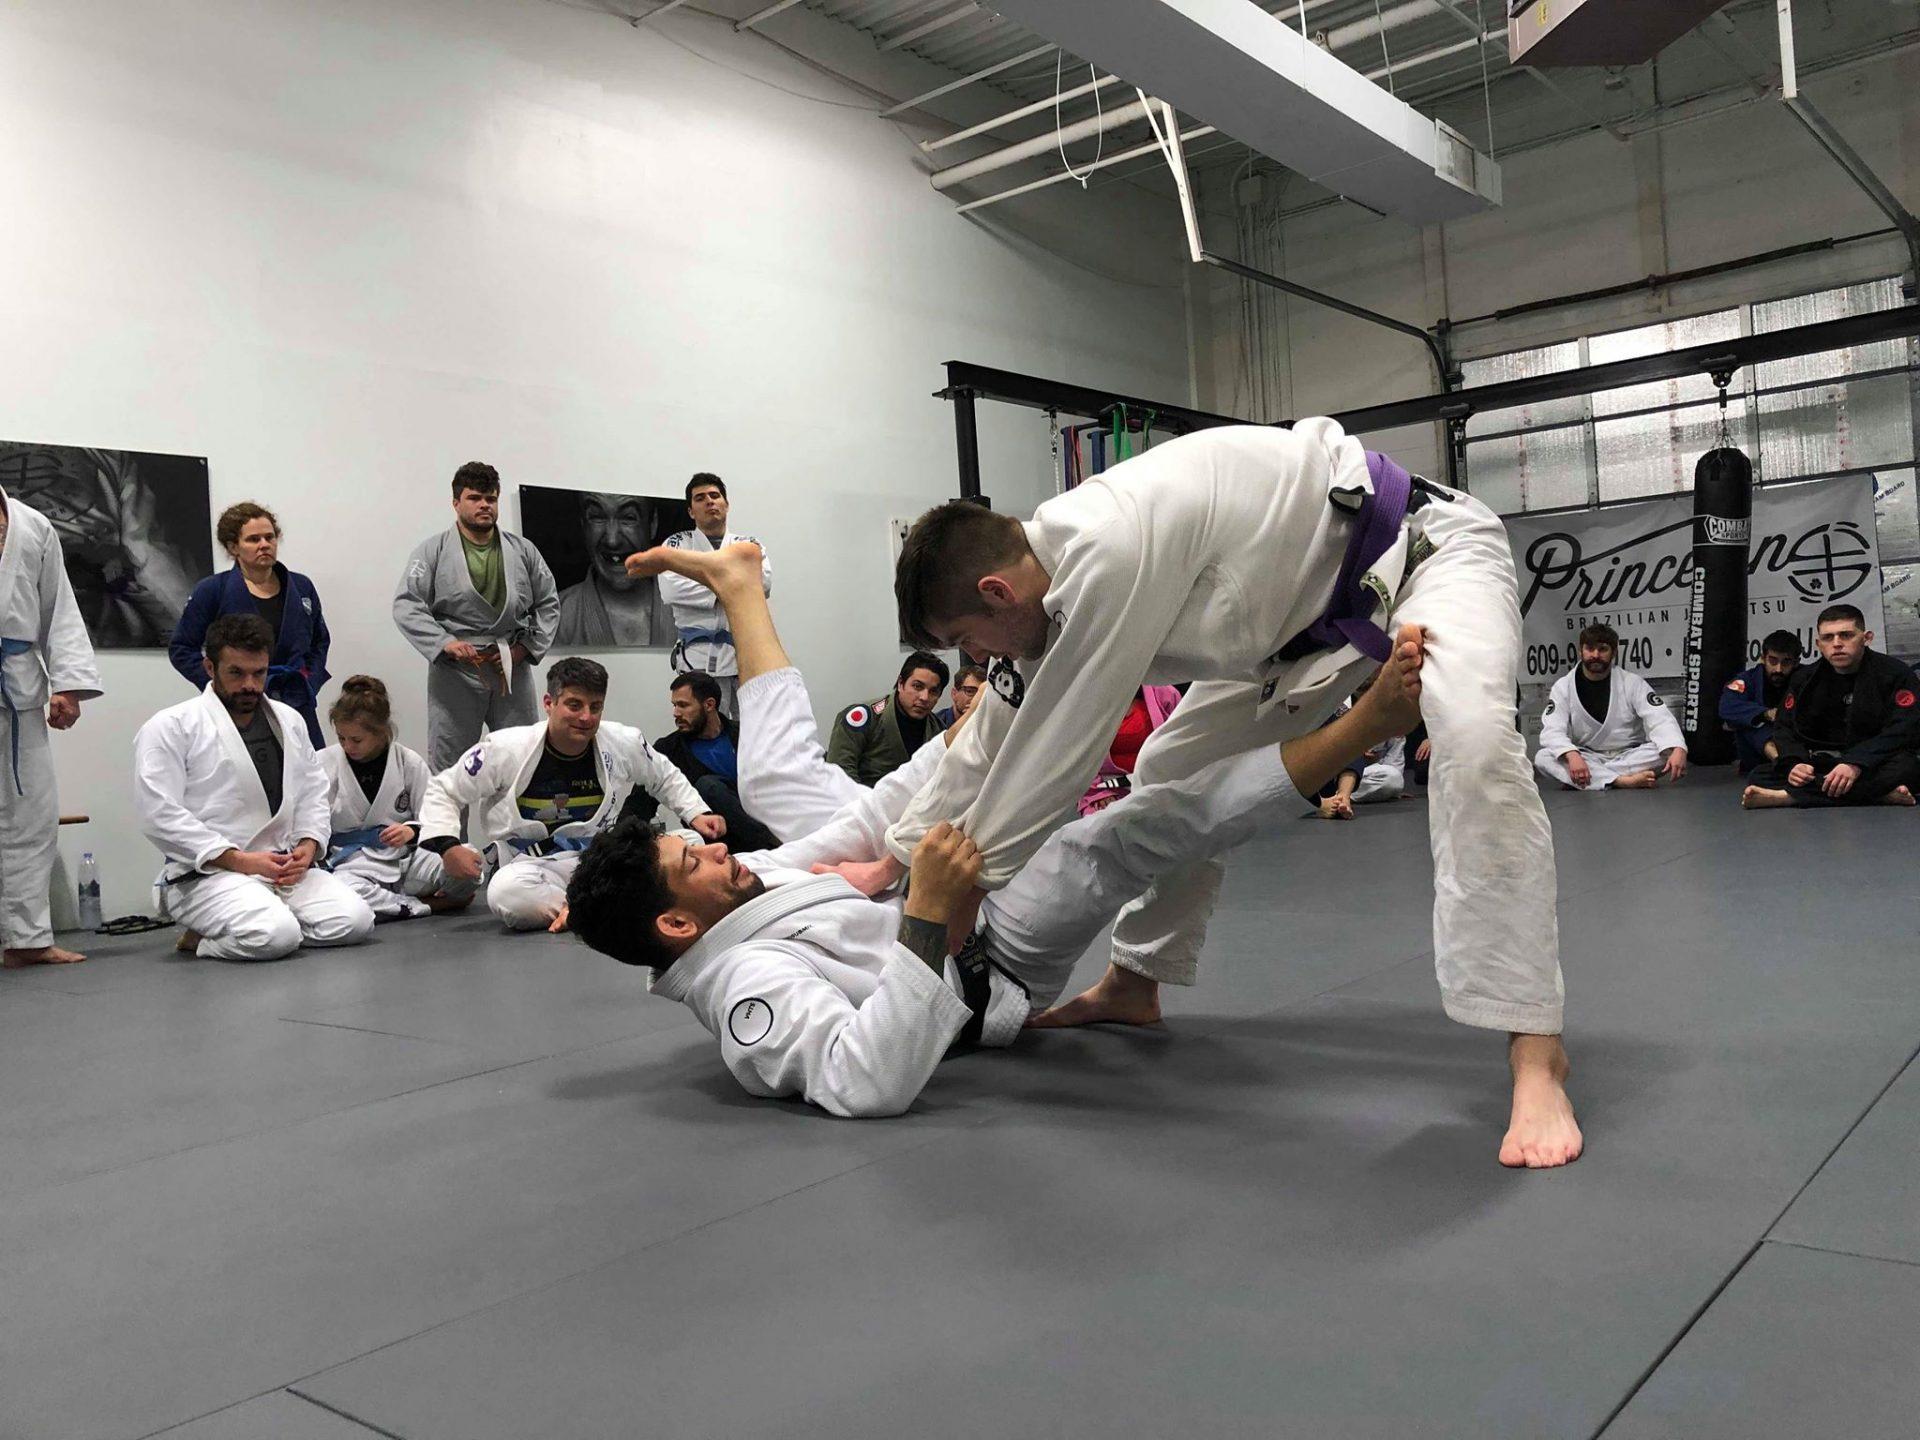 Matheus Diniz teaching lessons at the seminar this past Saturday